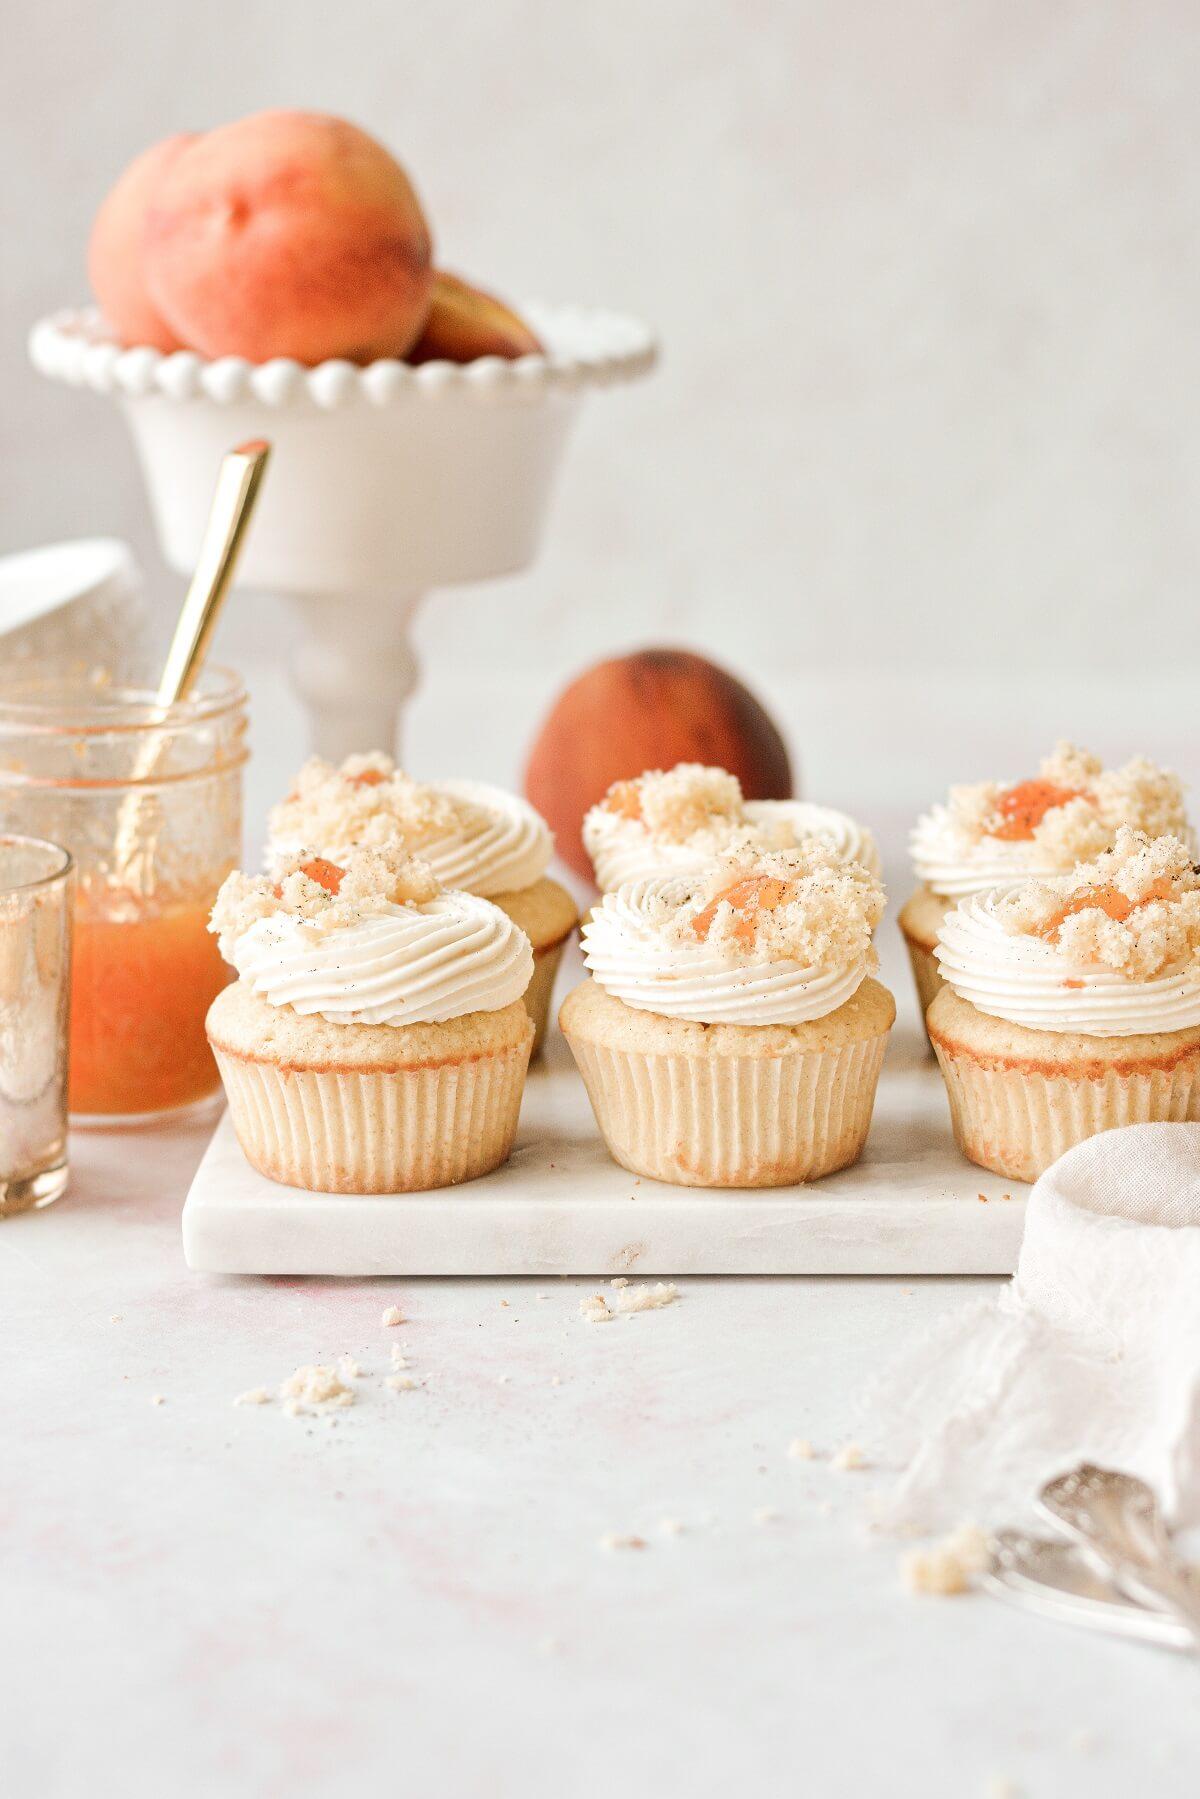 Peach cupcakes on a marble board.